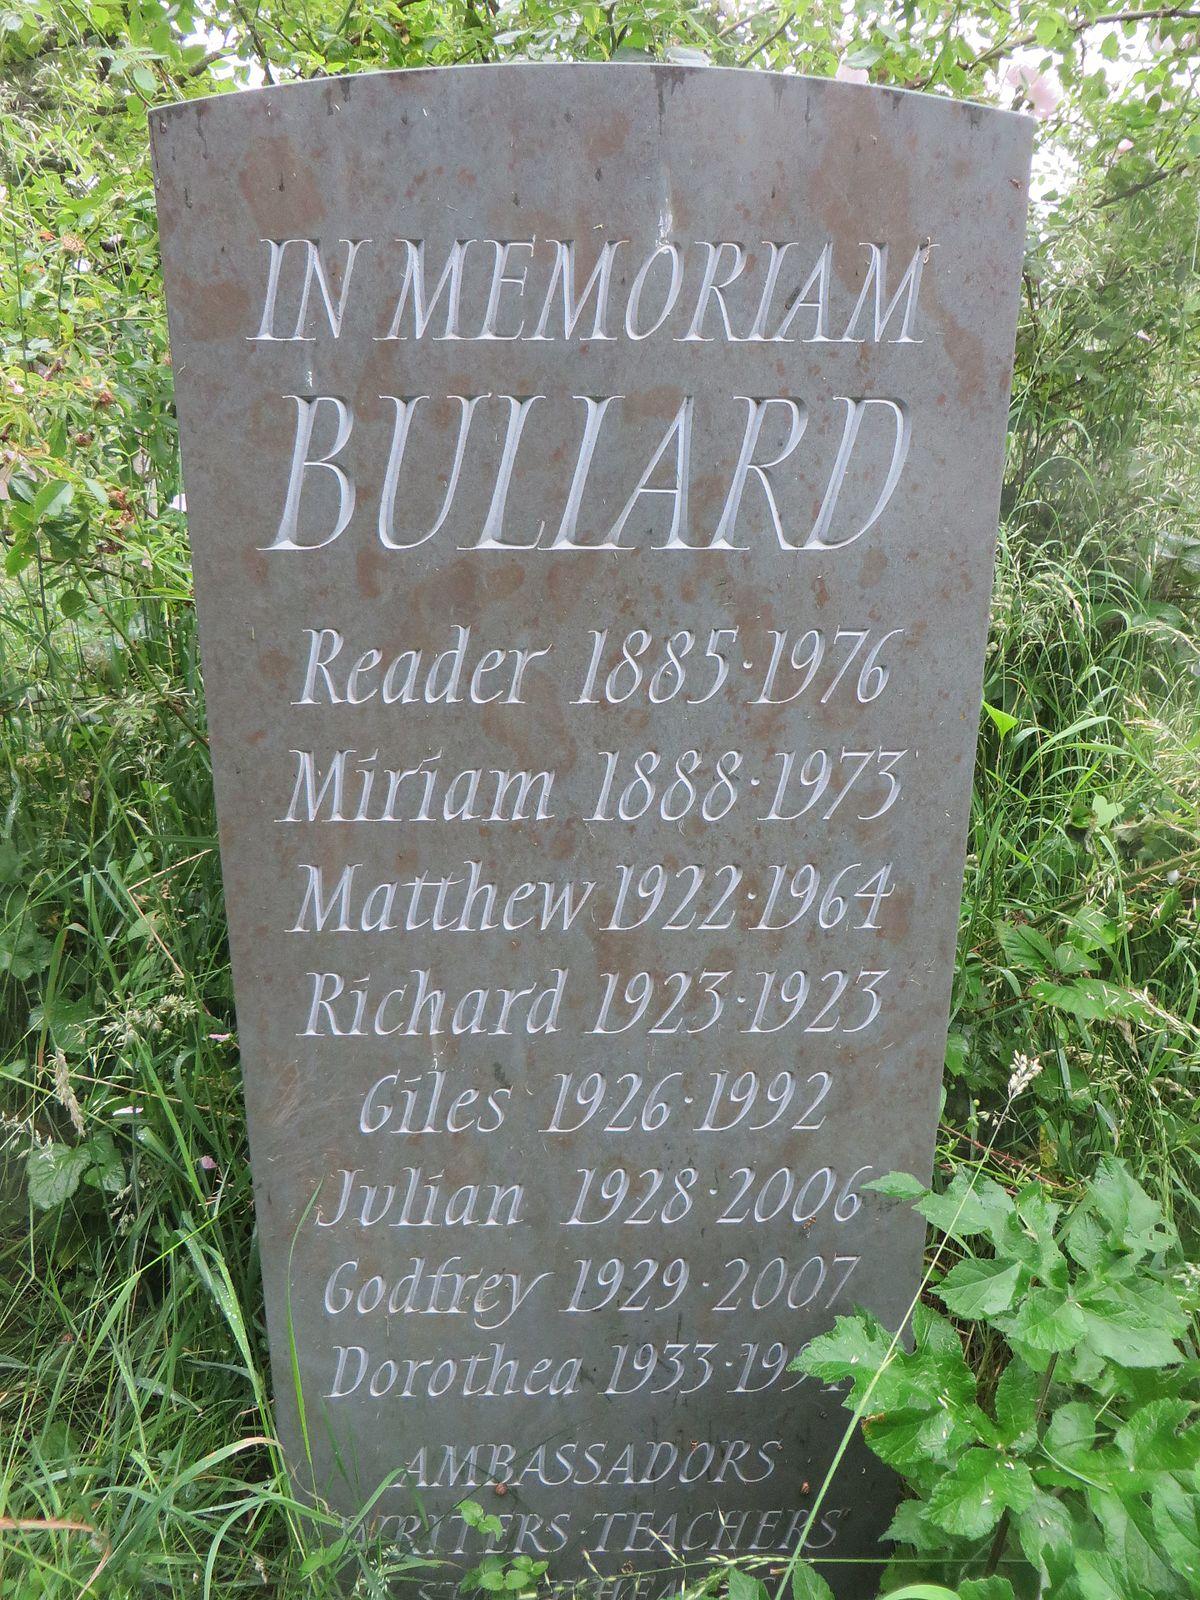 Reader Bullard - Wikipedia